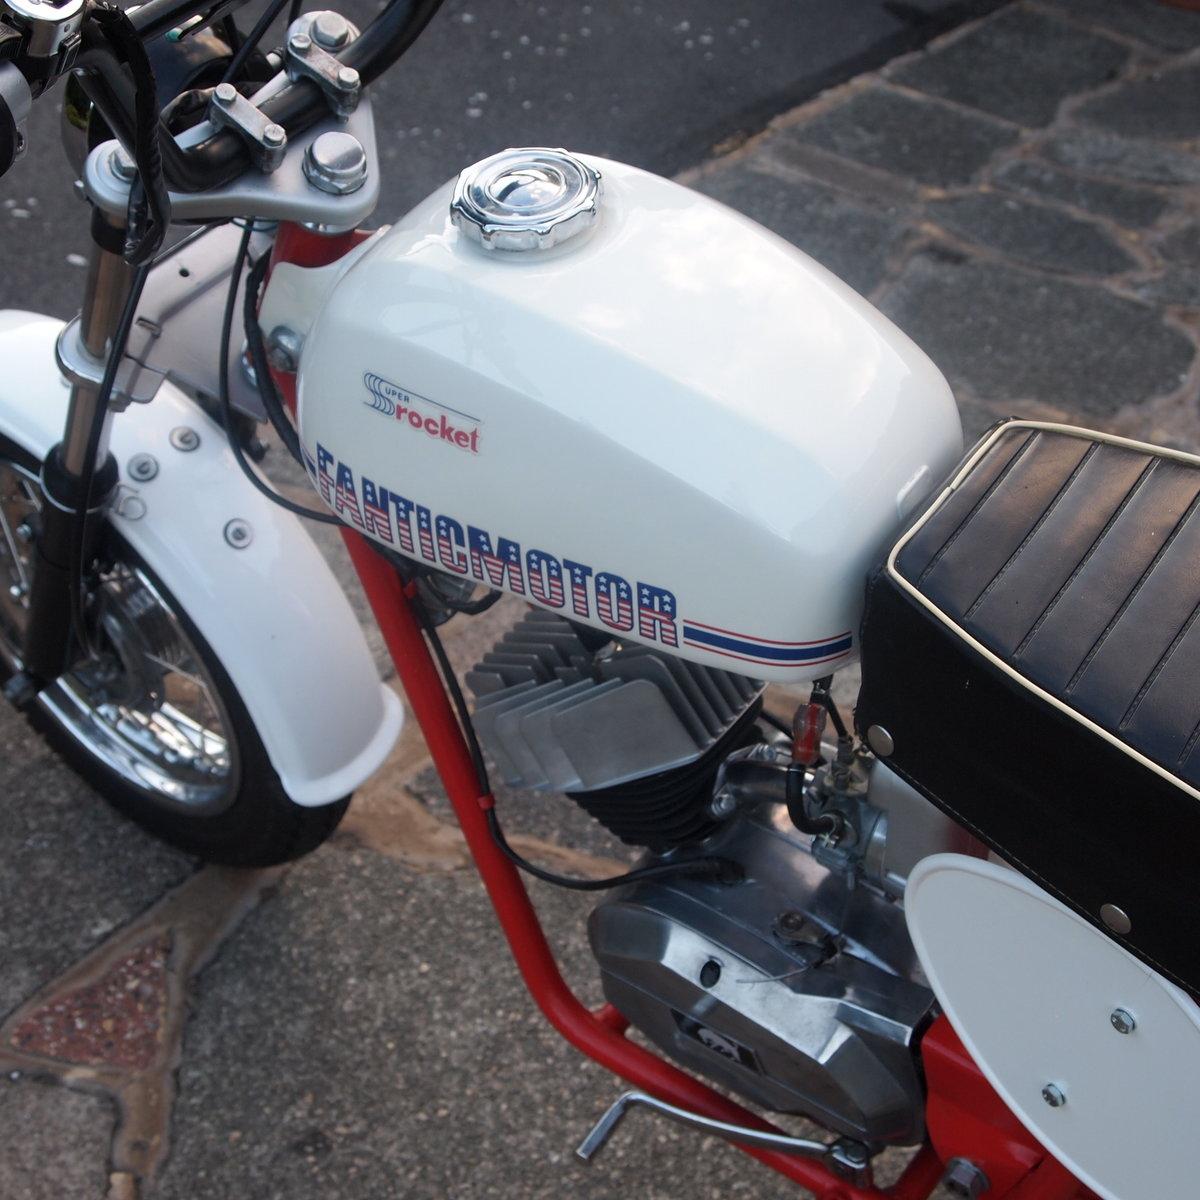 1973 Rare 49cc Fantic Super Rocket Monkey Bike, Wonderful. For Sale (picture 4 of 6)